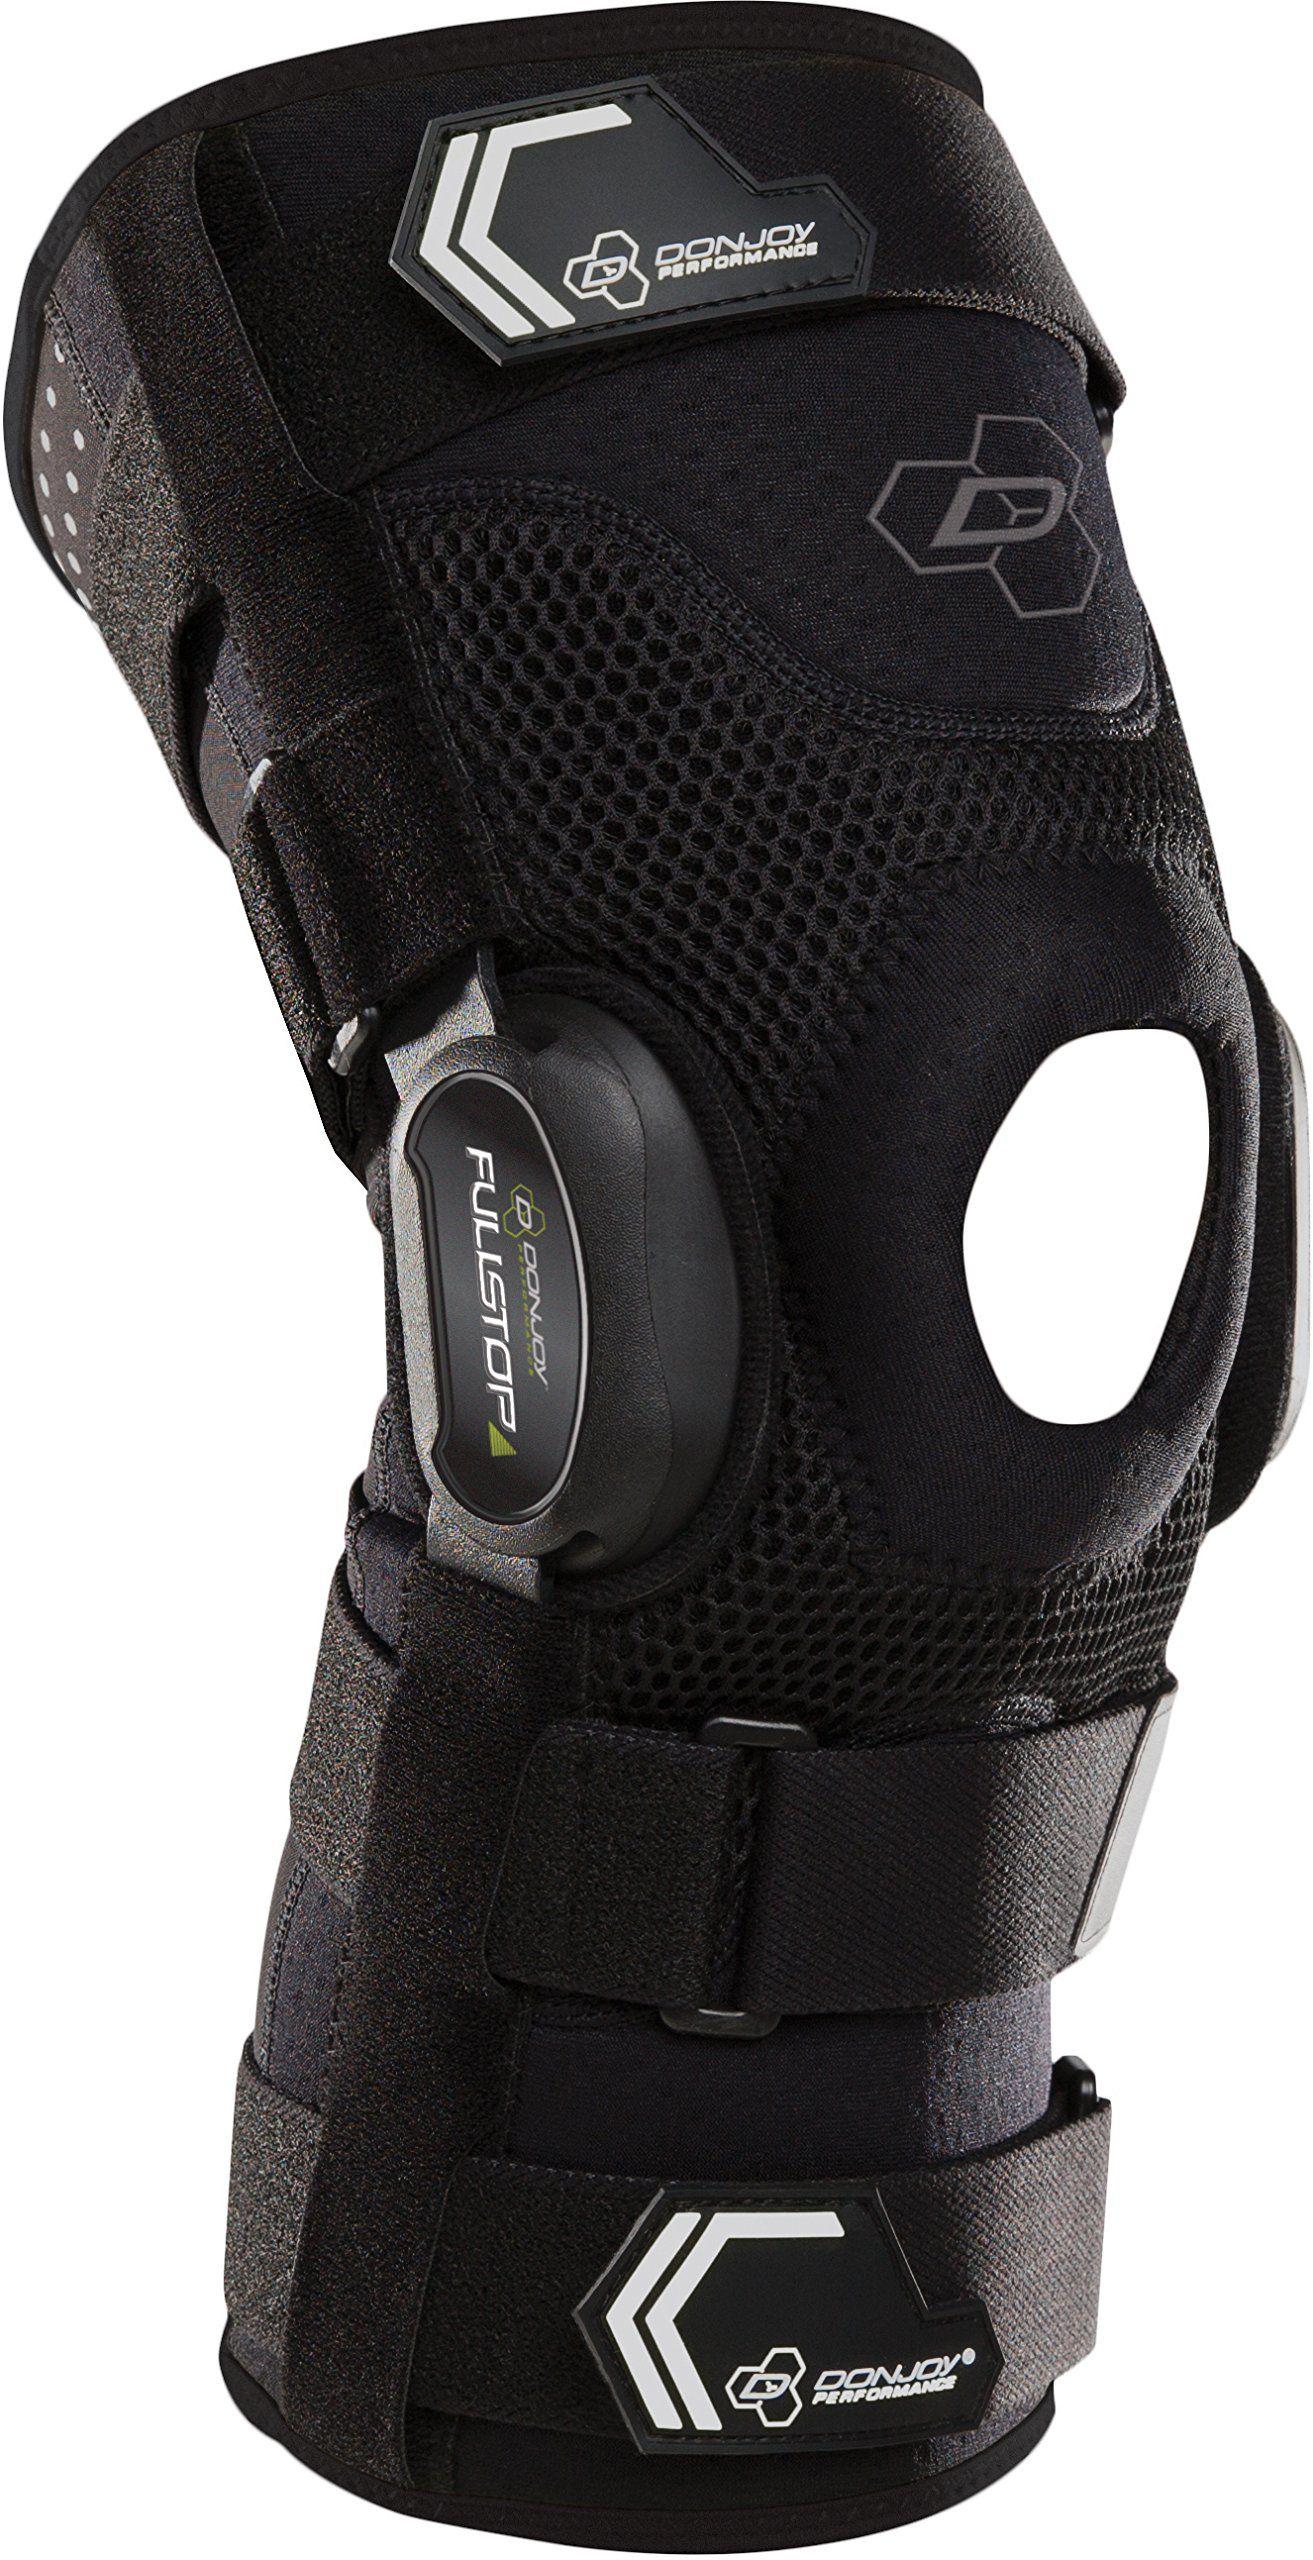 Donjoy performance bionic fullstop brace in 2020 knee